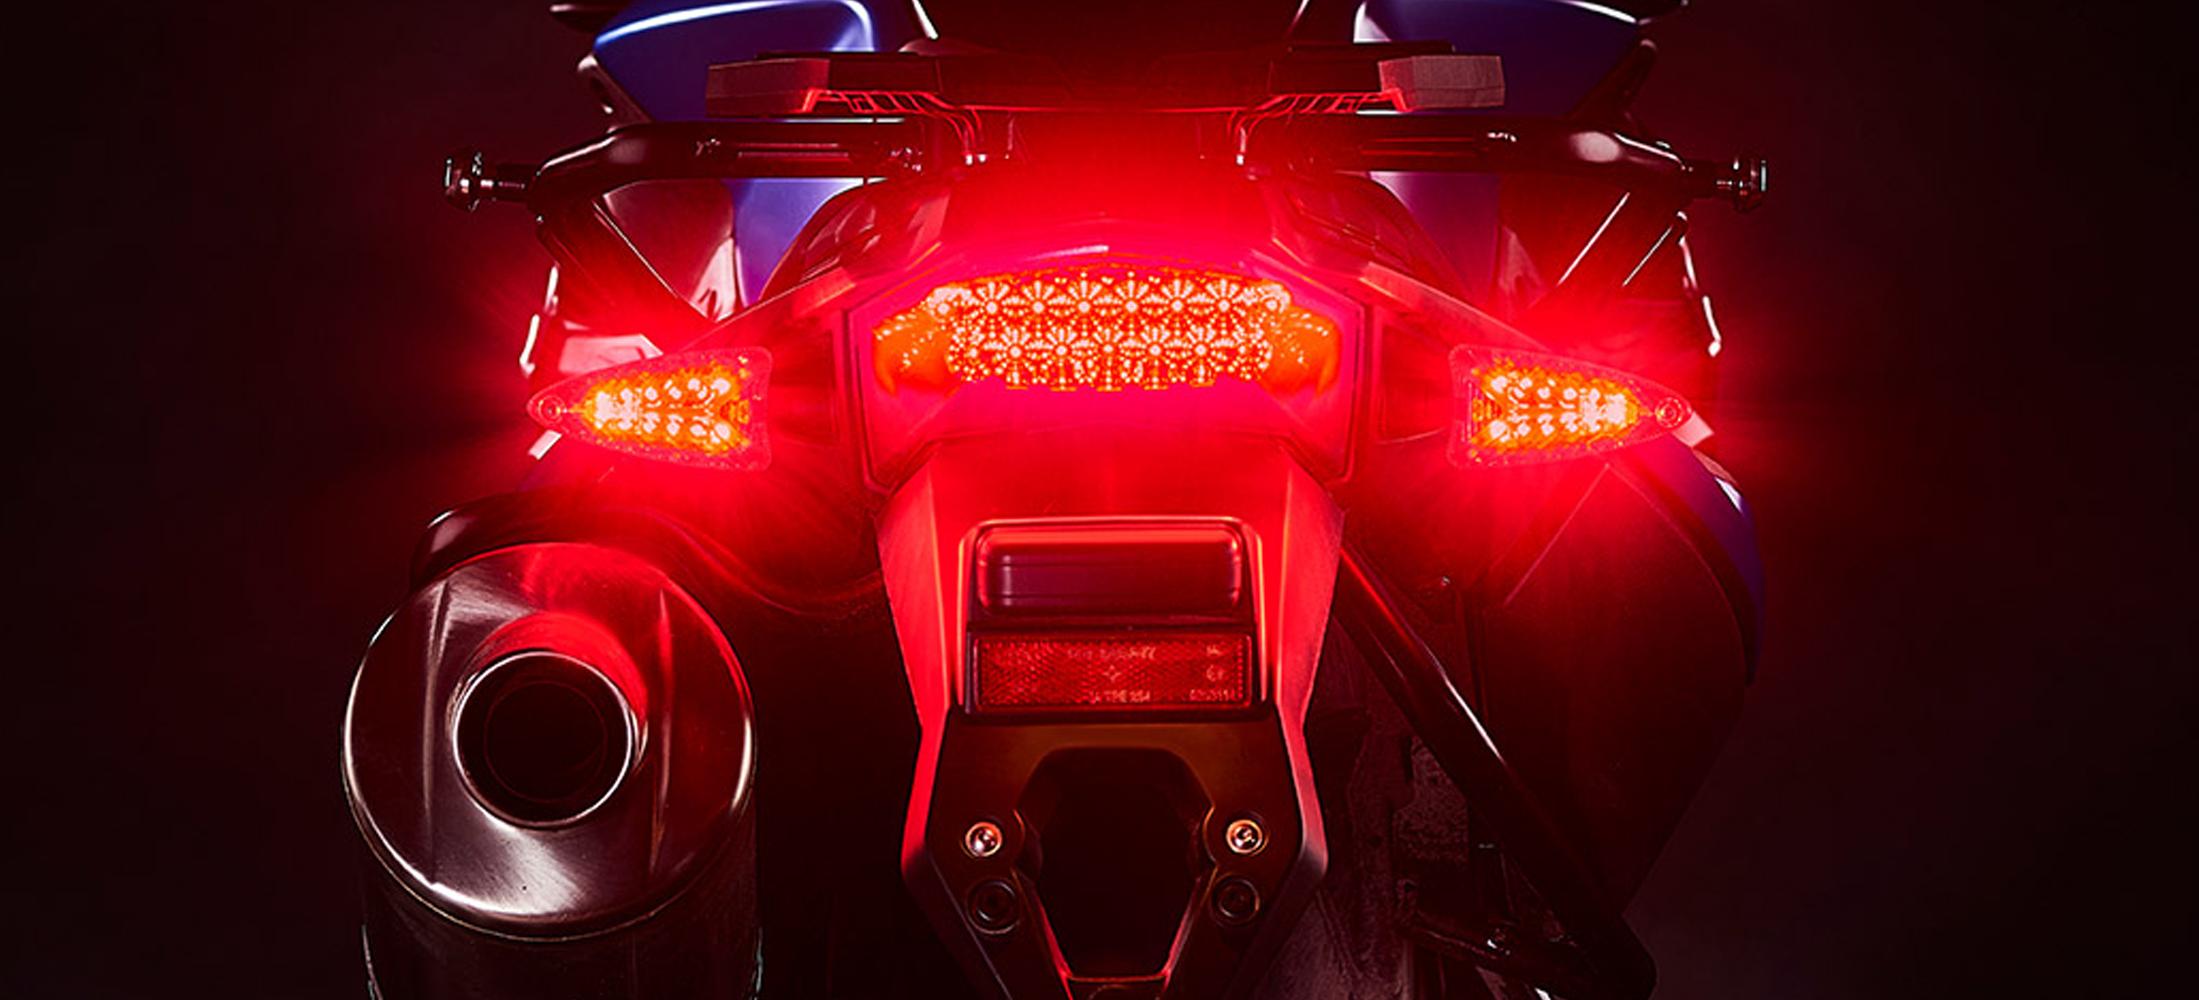 2-in-1 Dual Brake Light/Turn Signal Upgrades